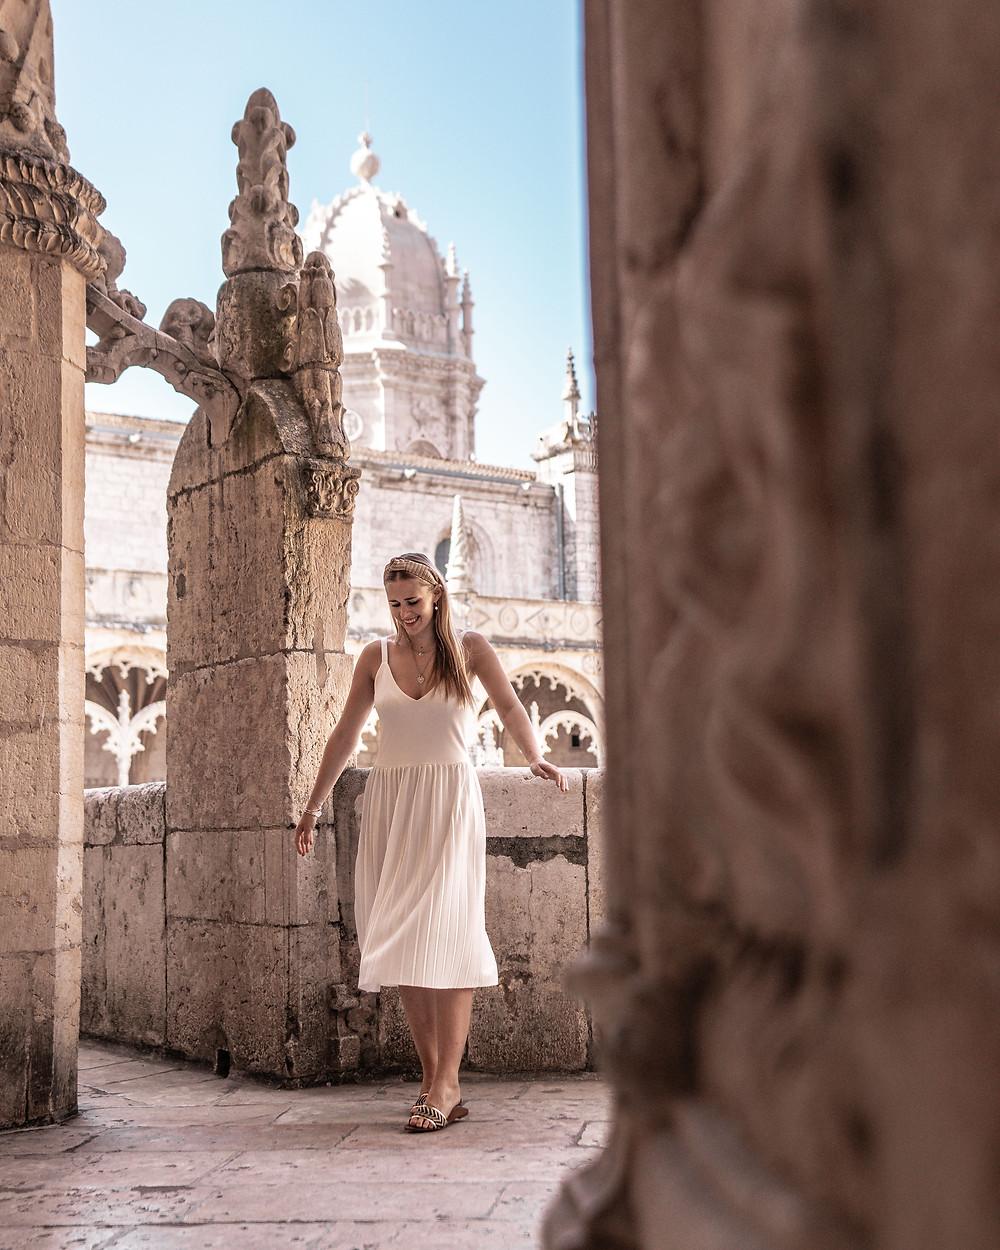 secret tip to visit Mosteiro dos Jerónimo in Belem